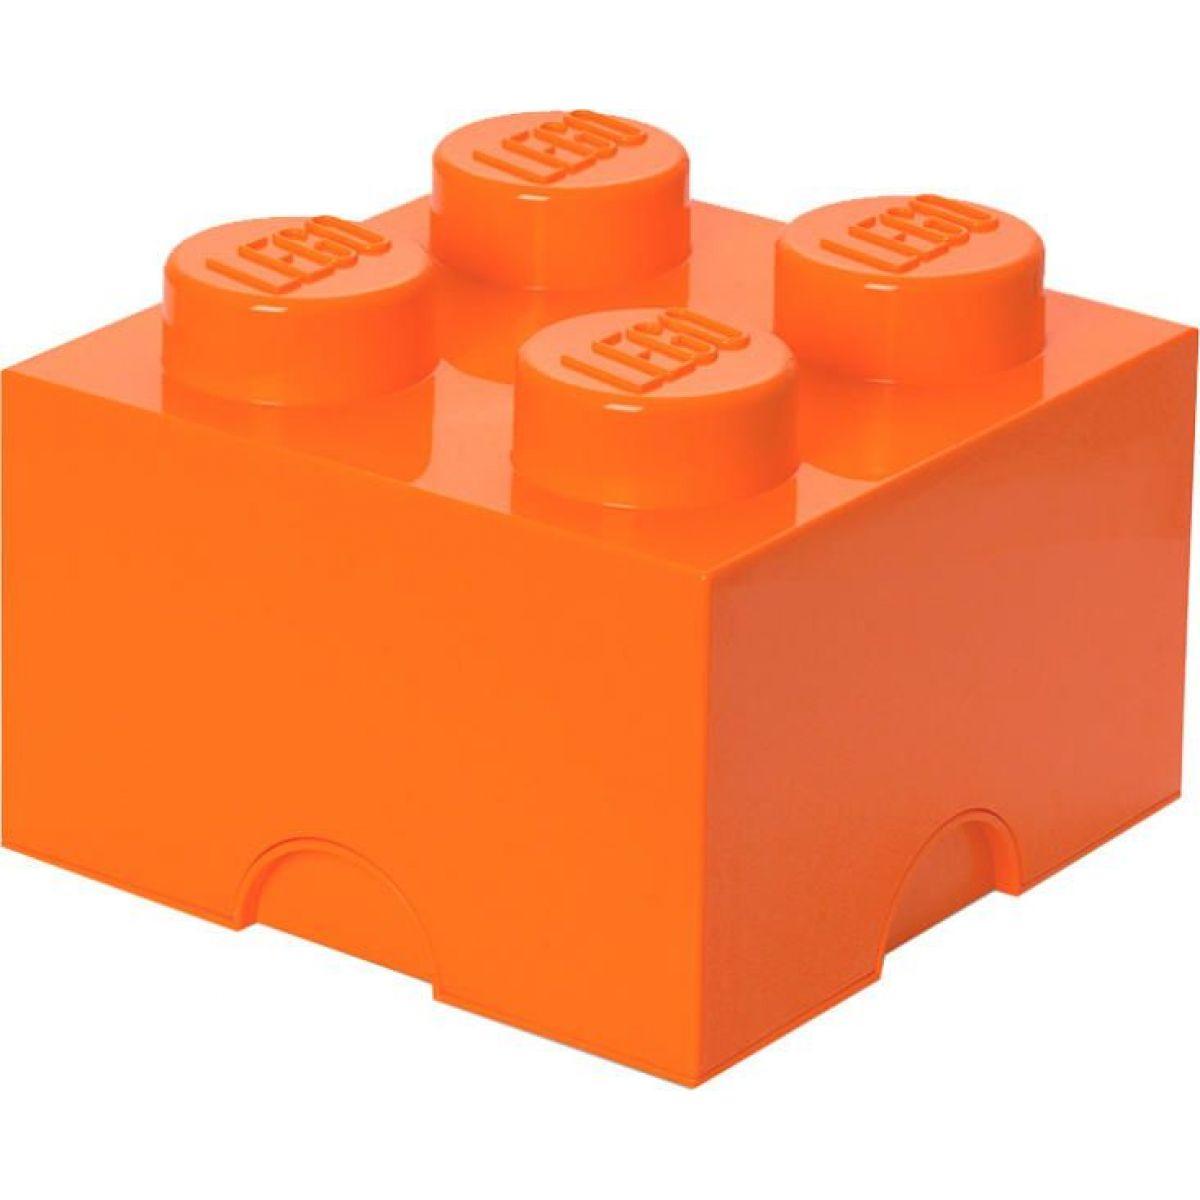 LEGO Úložný box 25 x 25 x 18 cm - oranžová